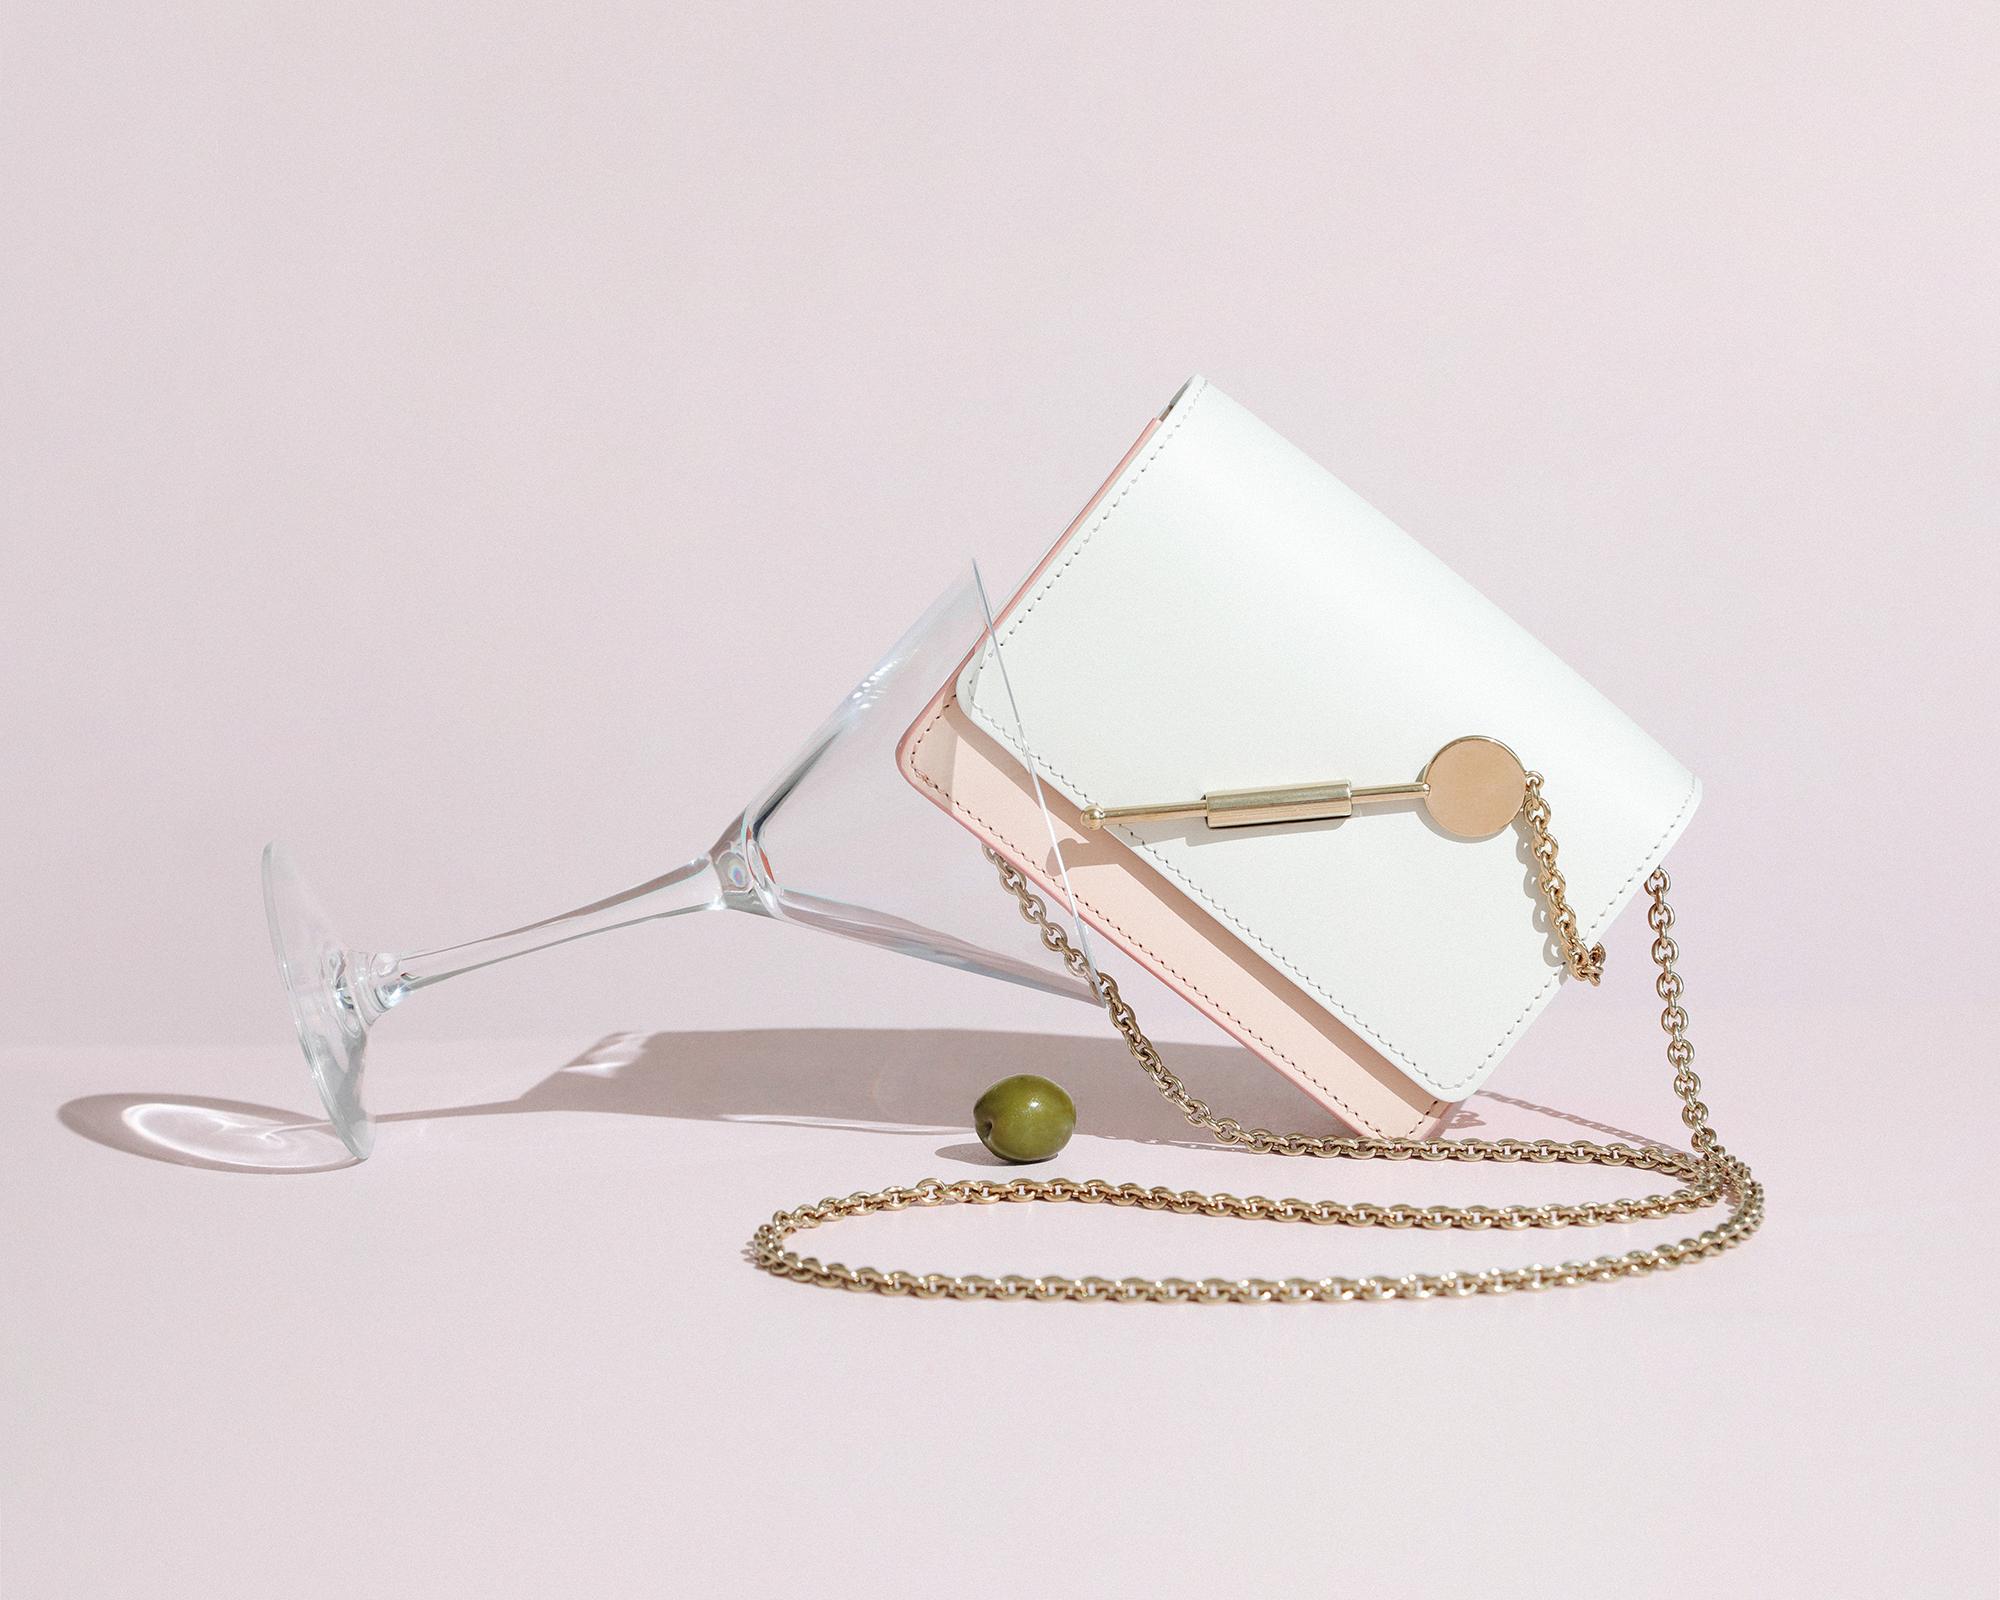 STILL LIFE COCKTAIL GLASS